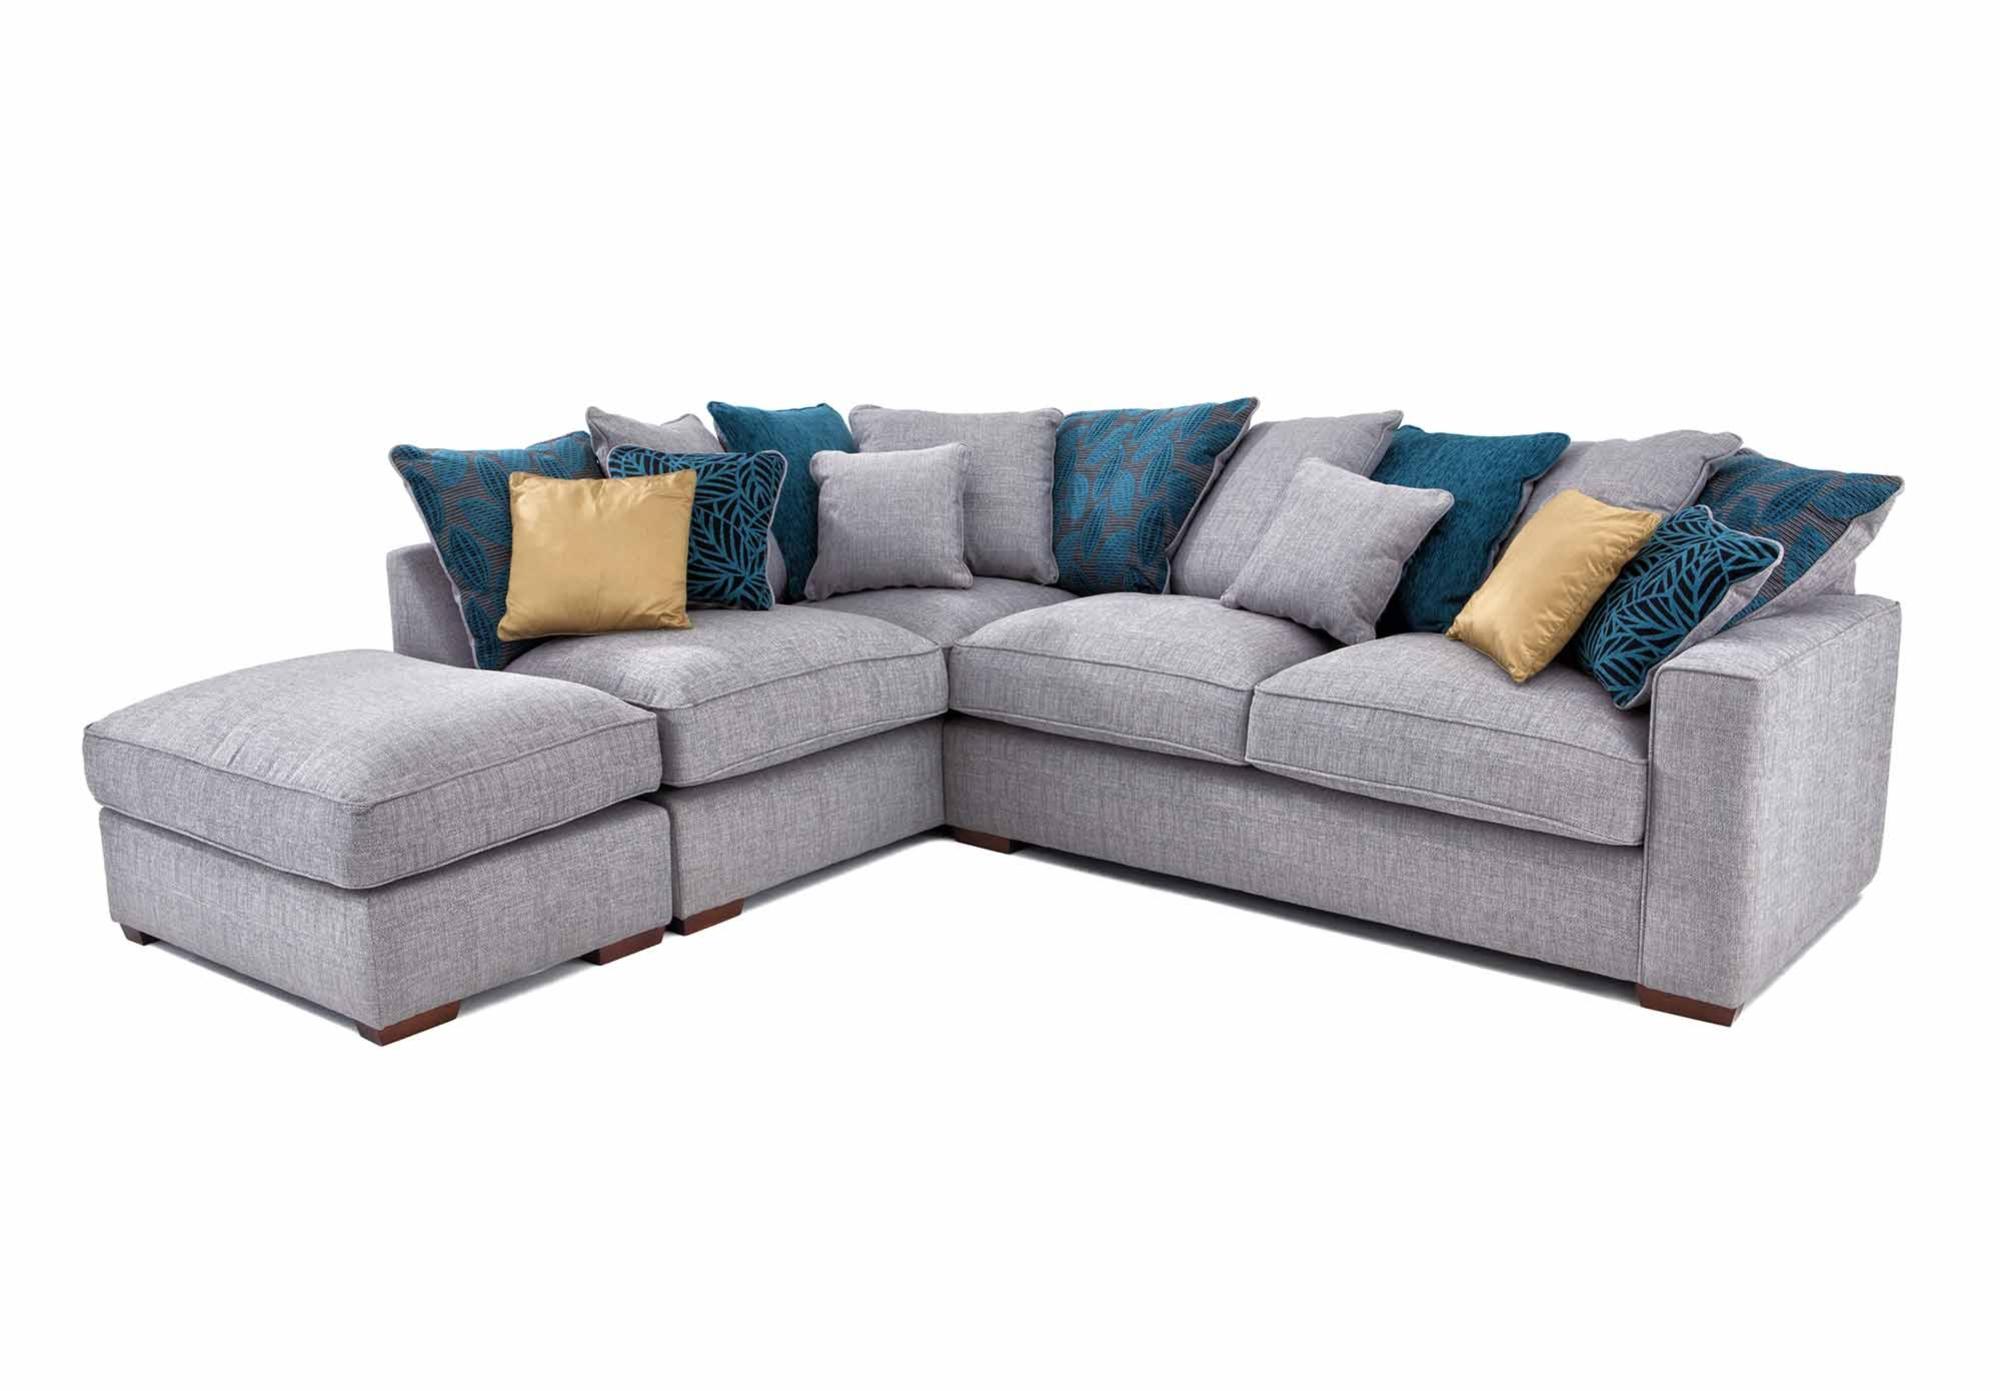 Sofa bed furniture village csl vantage sofa reviews for F furniture village